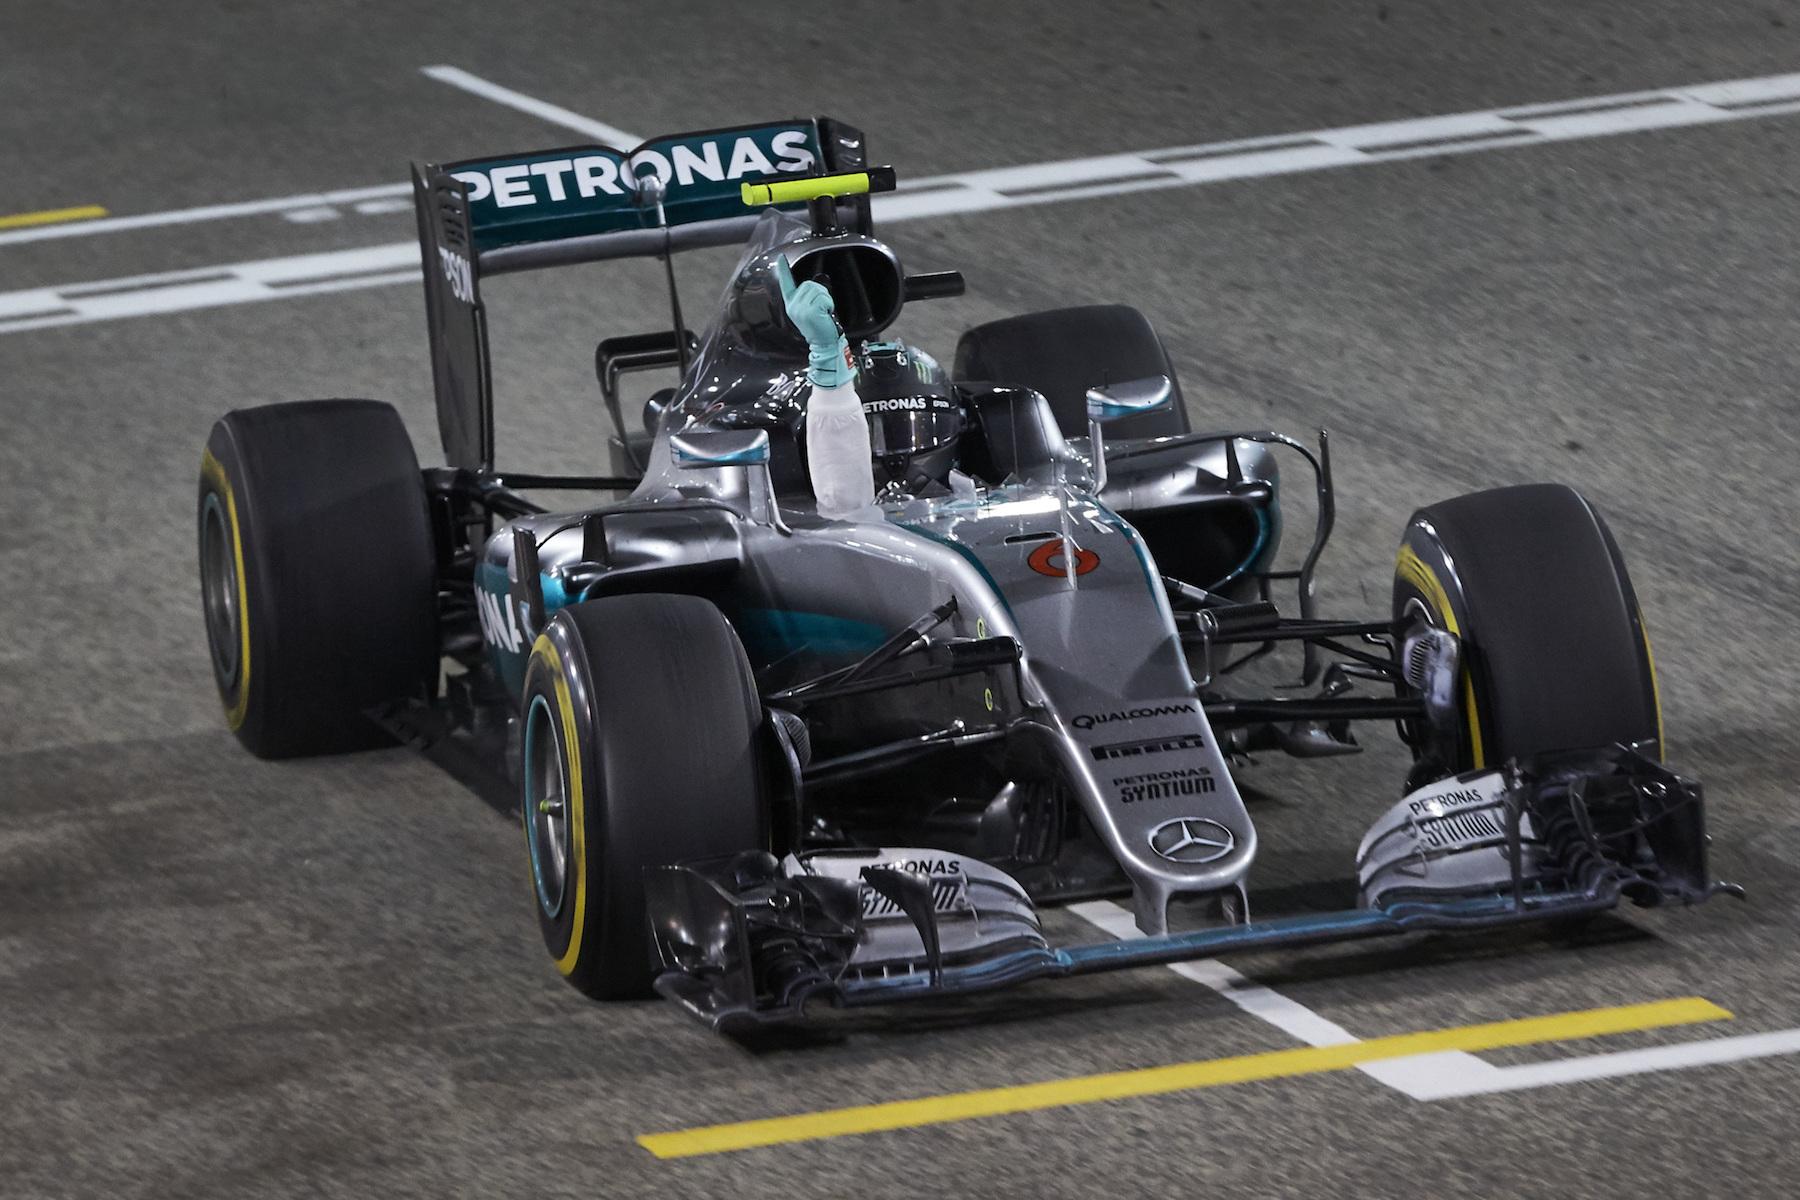 🇧🇭 Bahrain Grand Prix winner: 🇩🇪 Nico Rosberg